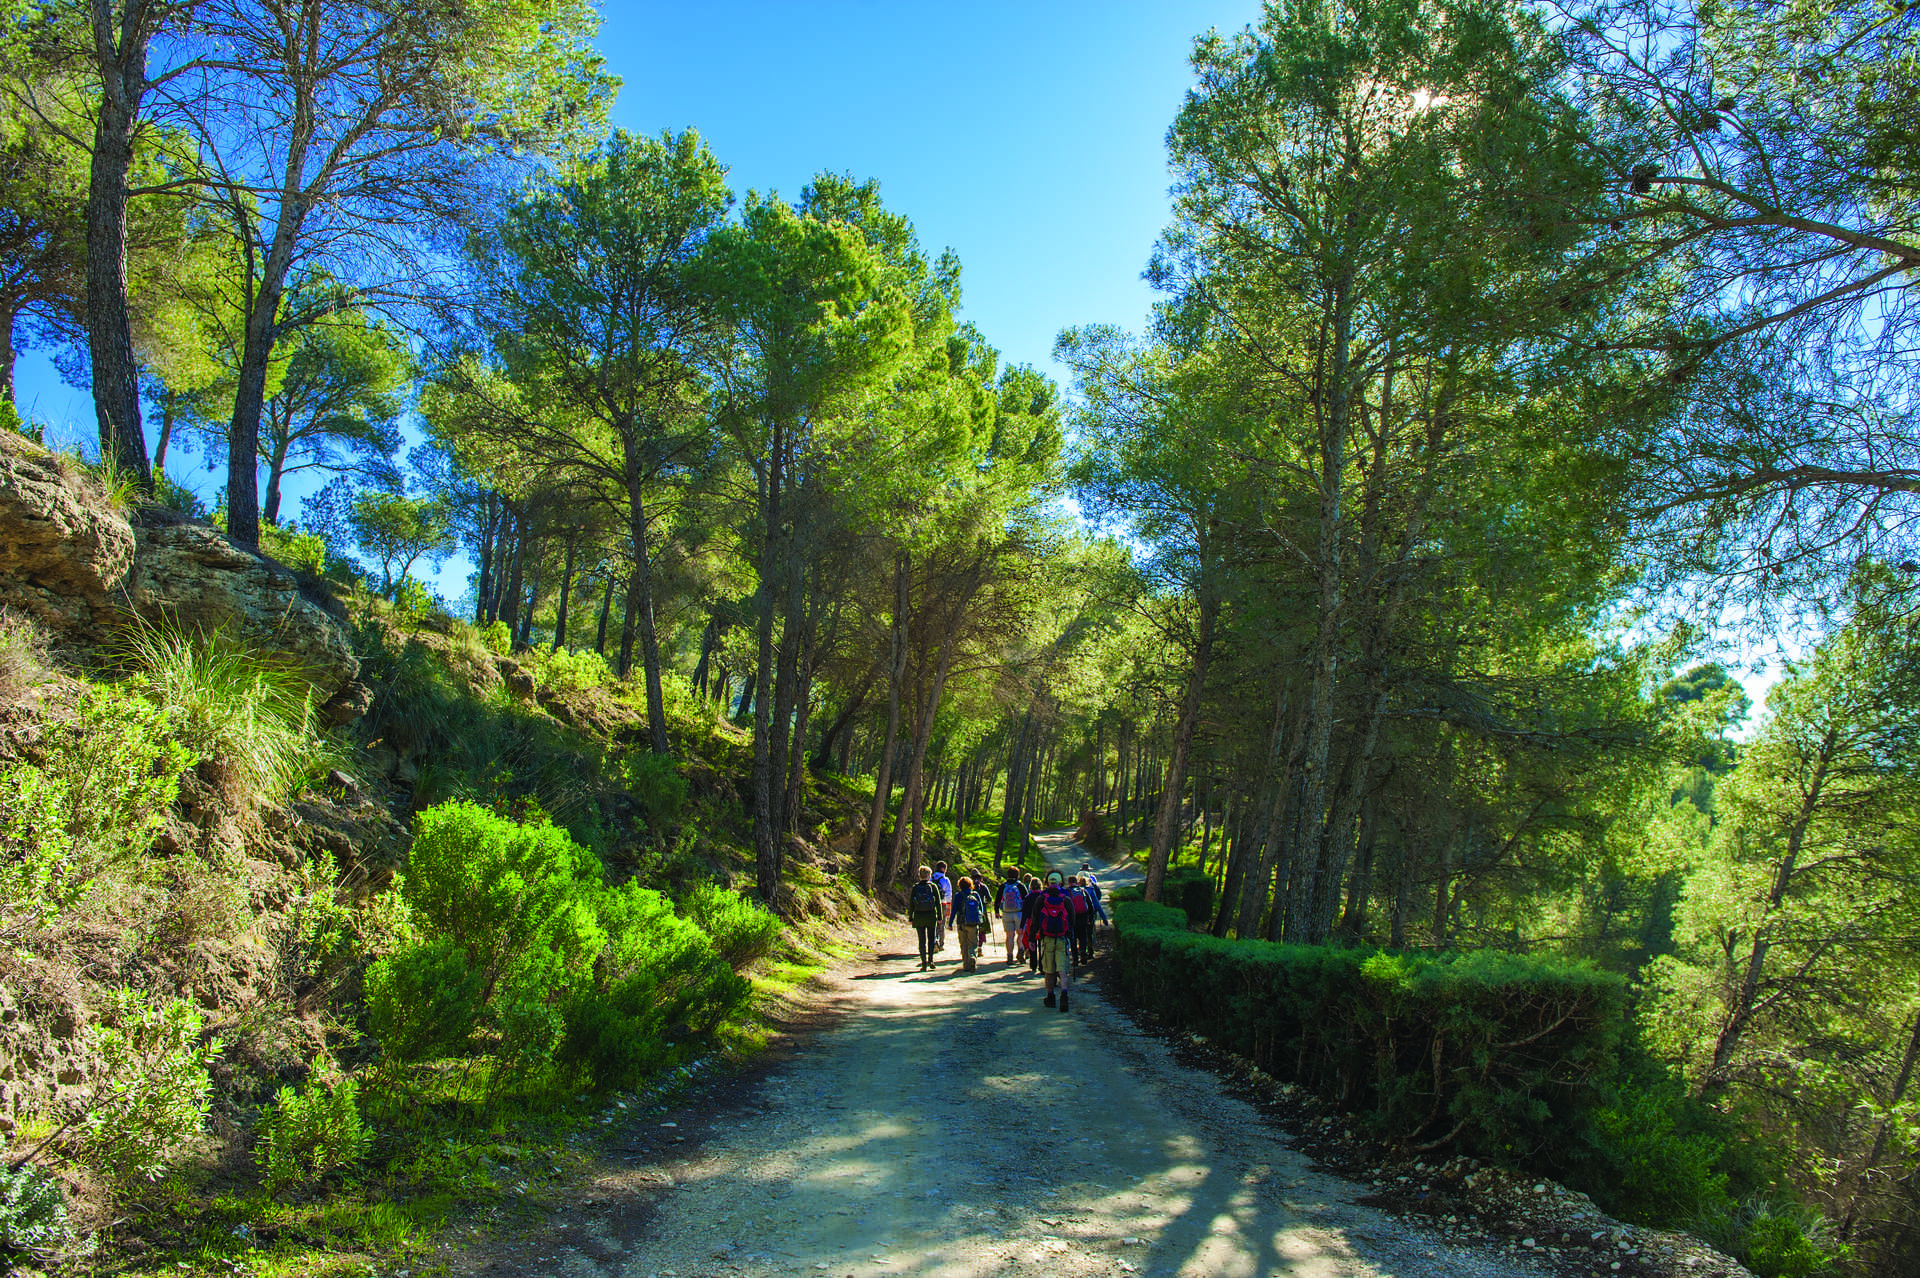 Rutas De Senderismo Web Oficial De Turismo De Andalucía